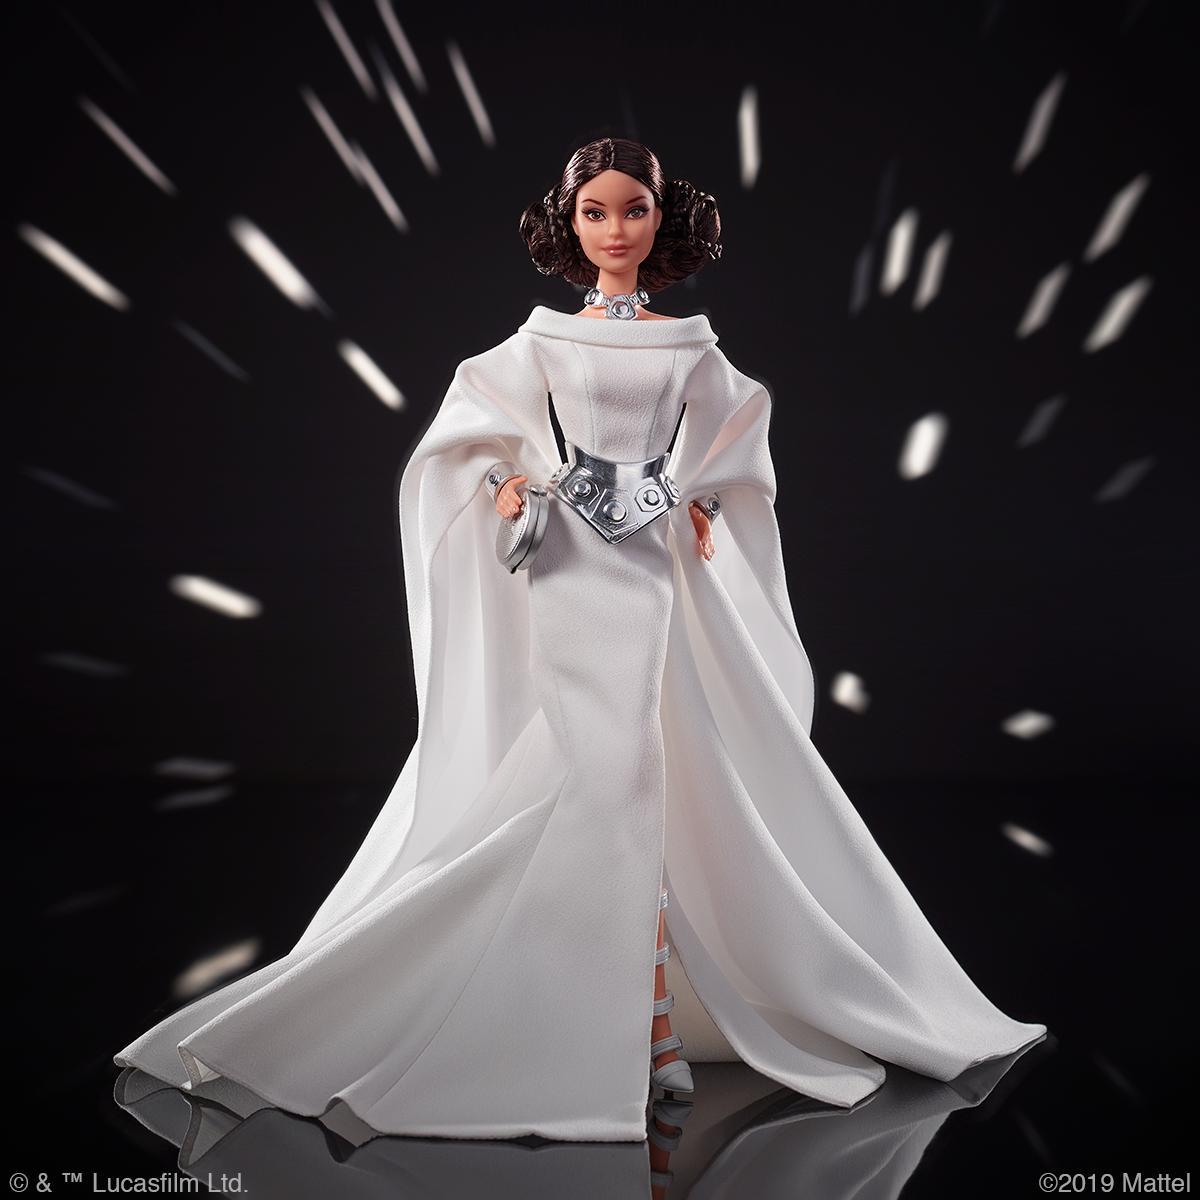 Princess Leia Star Wars Barbie Barbie gets into cosplay with new Star Wars line